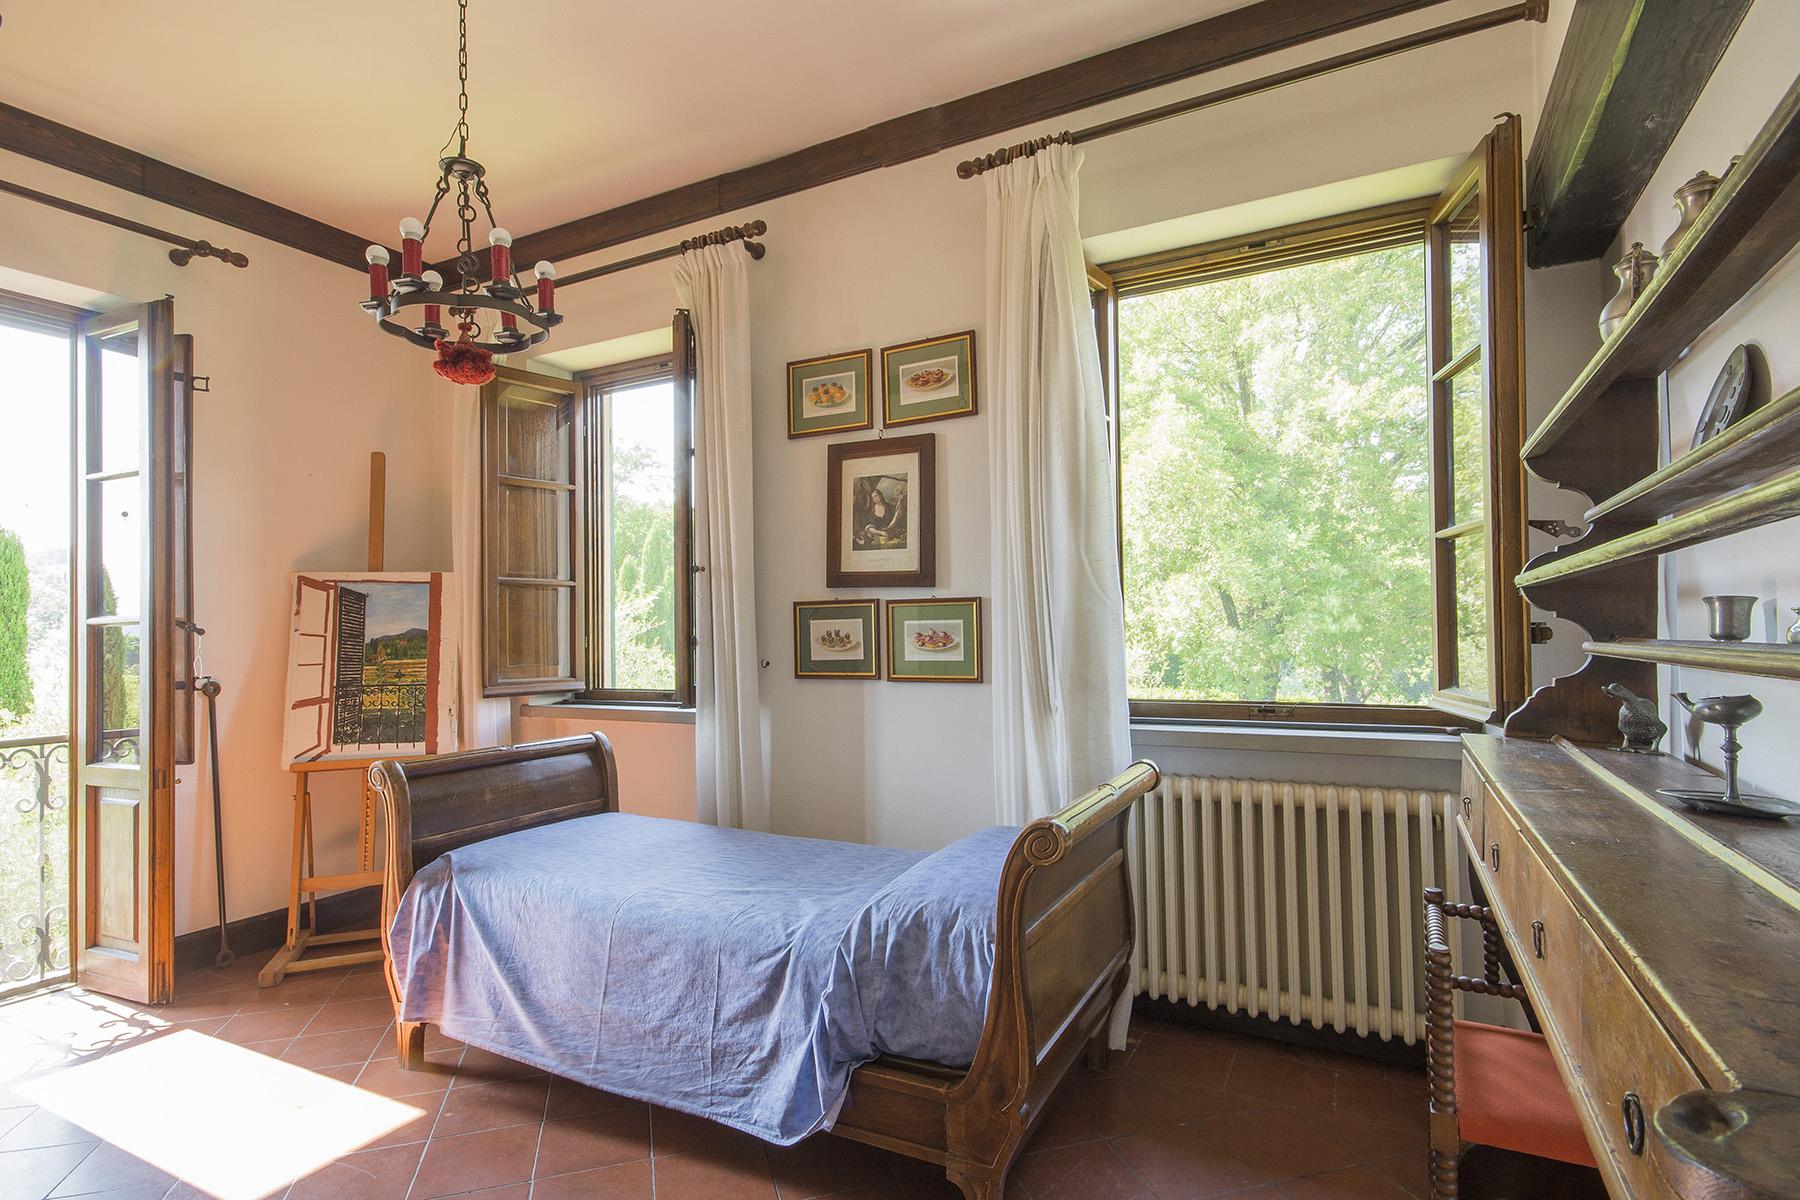 Villa in Vendita a Lucca: 5 locali, 600 mq - Foto 23